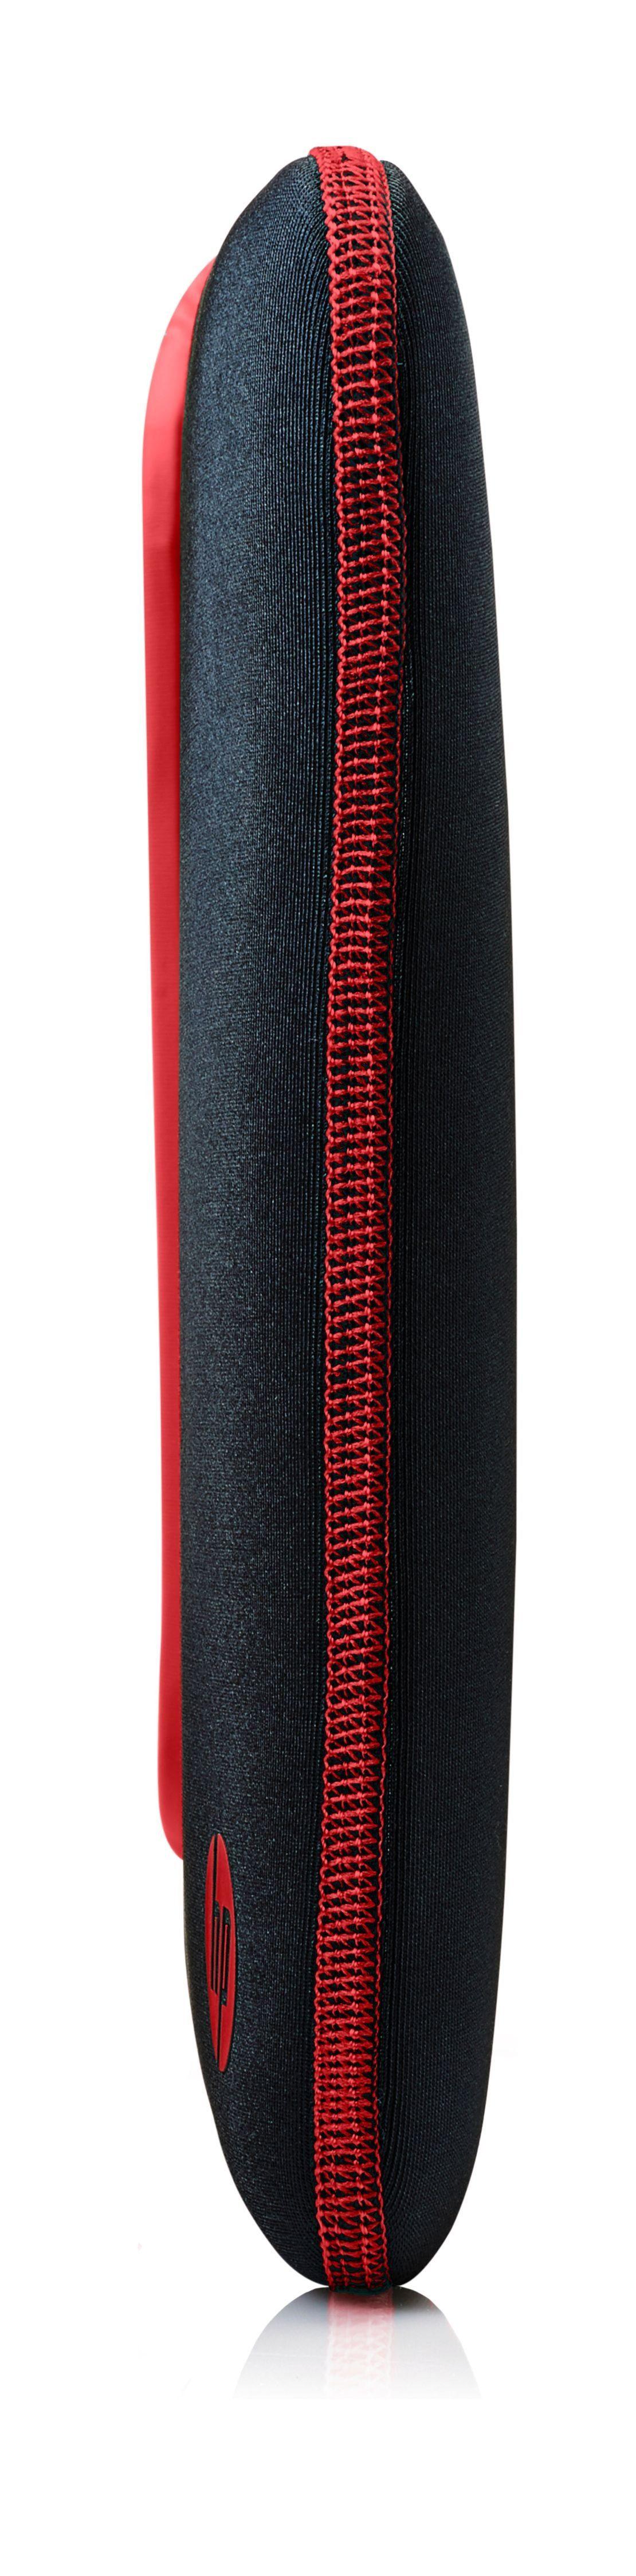 Zoll Cm Online Kaufen 39 Artikel Hp Black Neoprenhülle nr 6 Sleeve red 62 1434952550 15 Notebook wYxqFazS